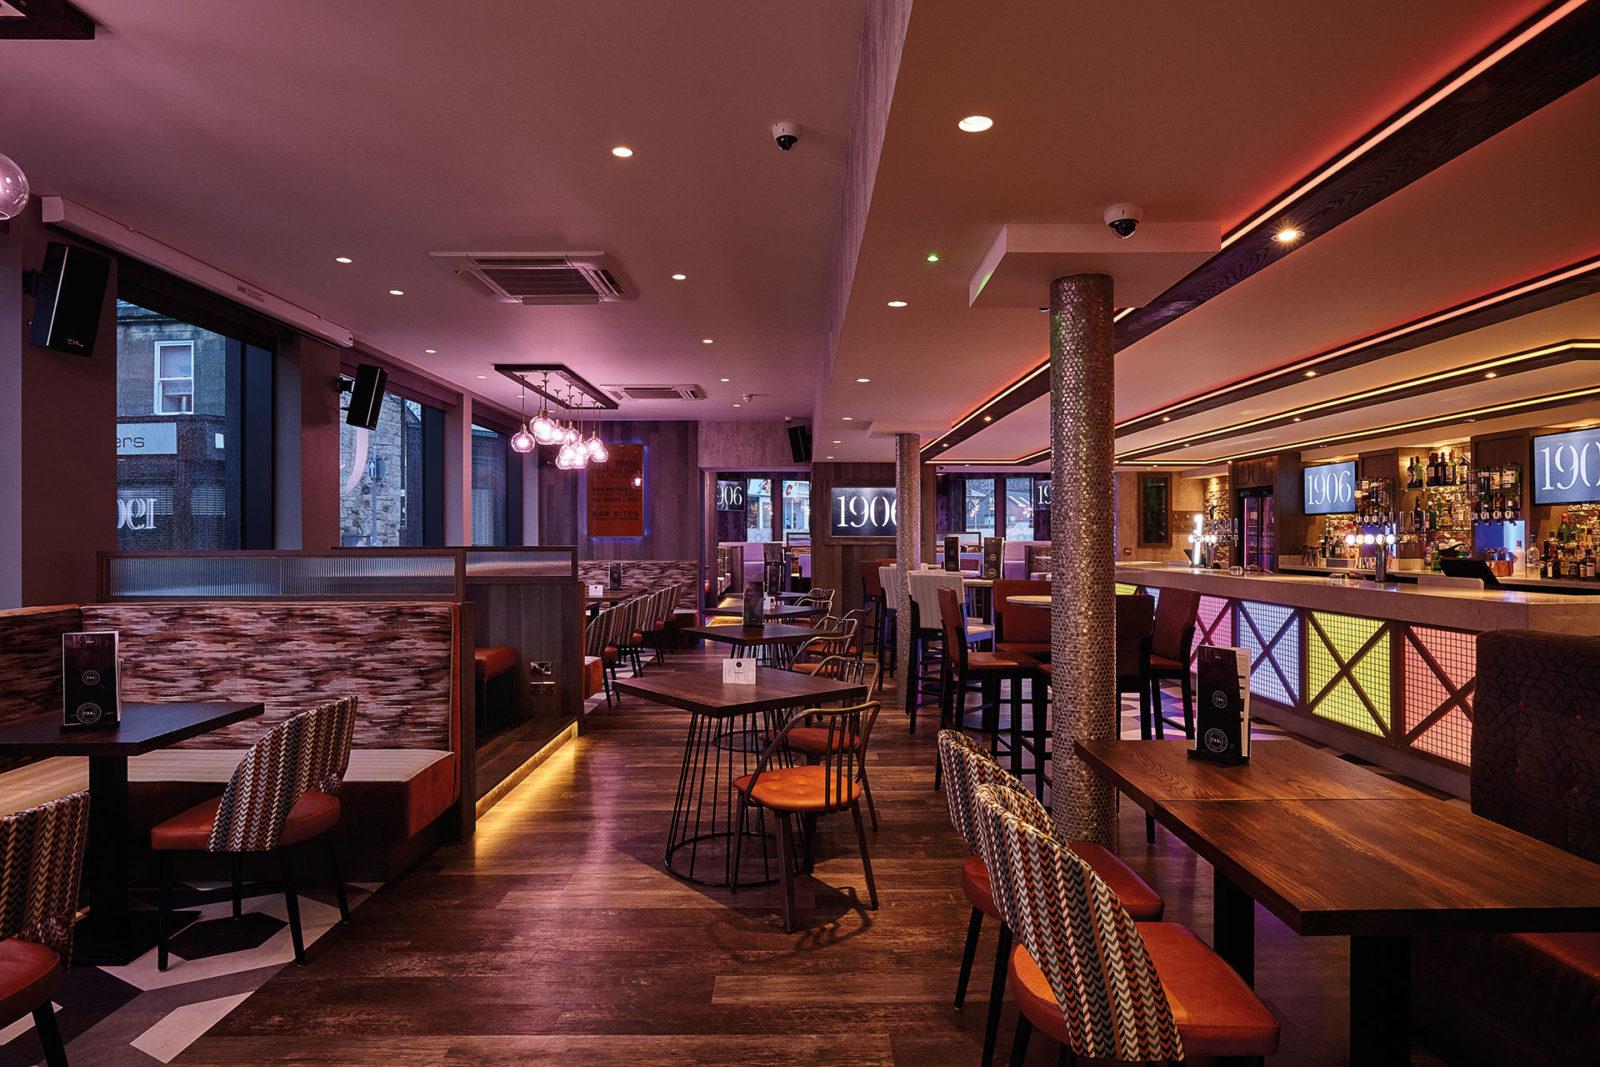 1906 Lounge Bar Interior